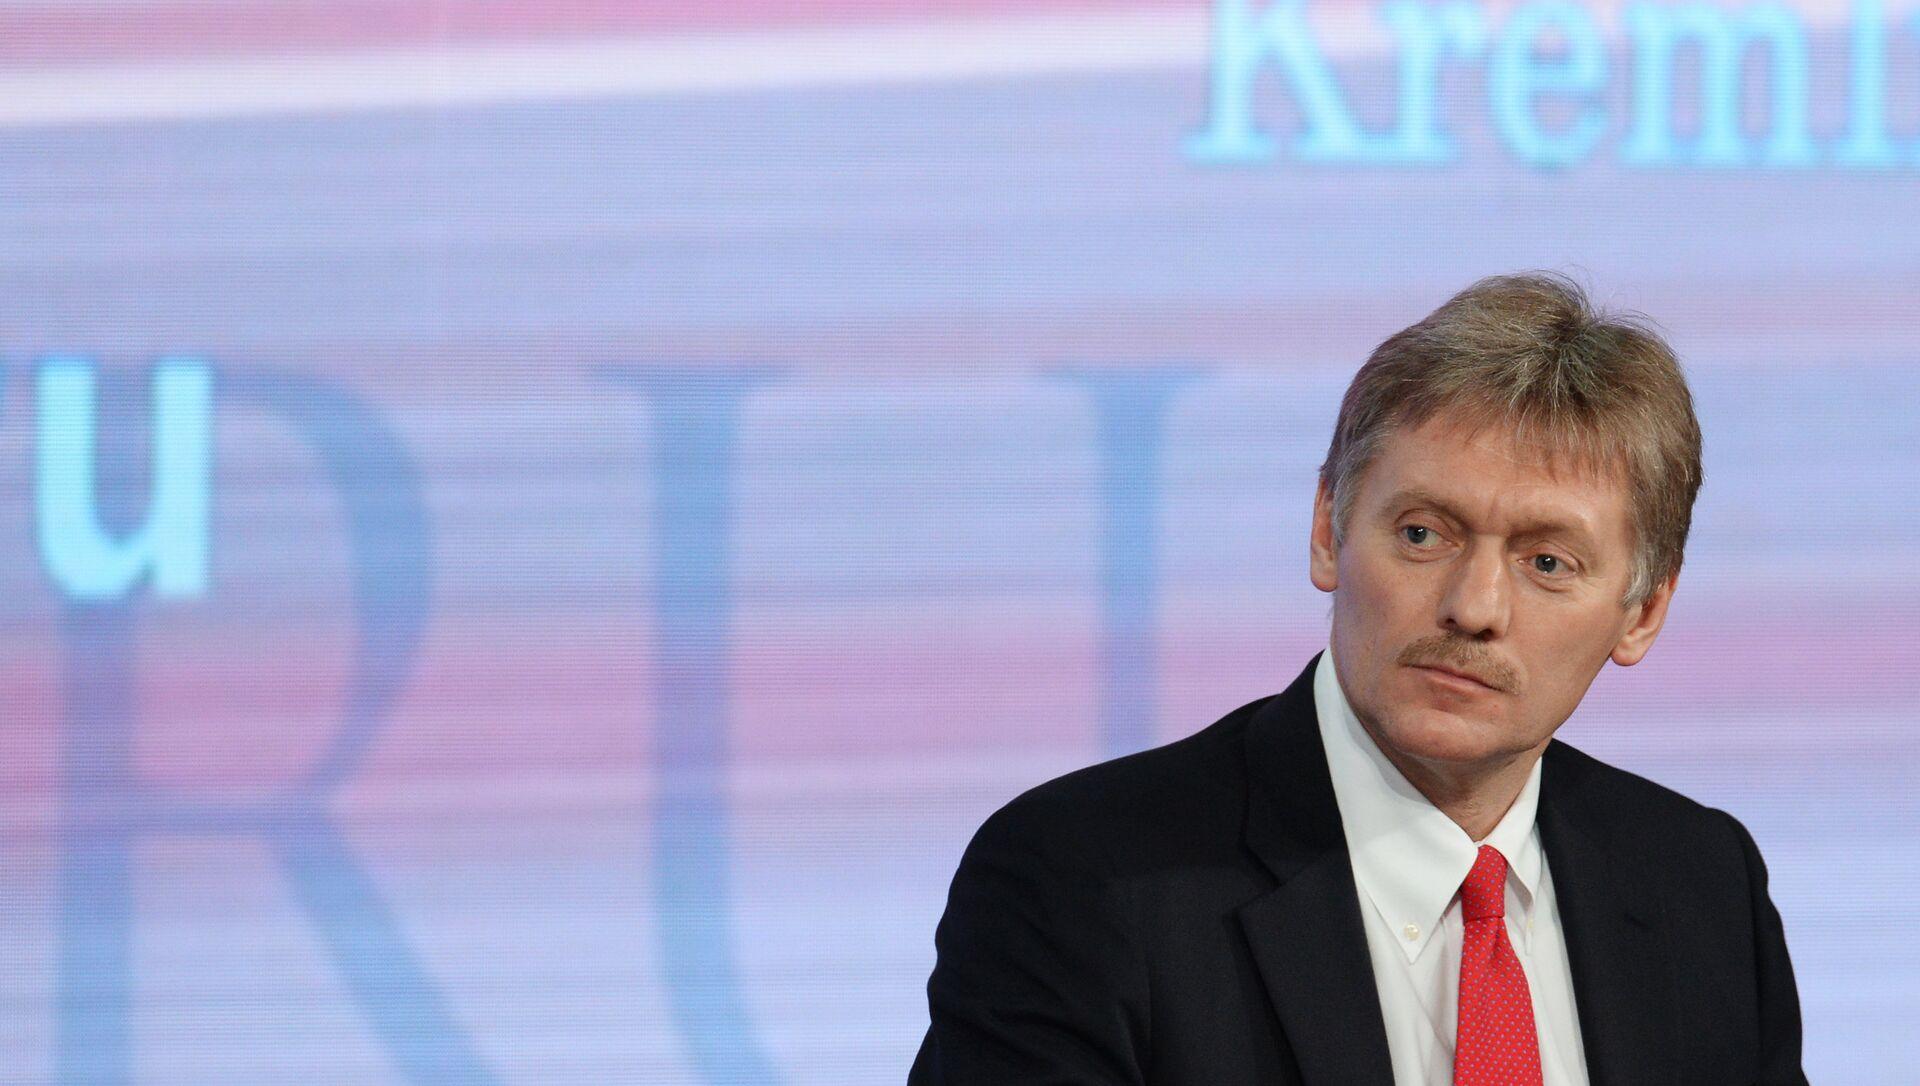 Пресс-секретарь президента РФ Дмитрий Песков - Sputnik Азербайджан, 1920, 24.09.2021